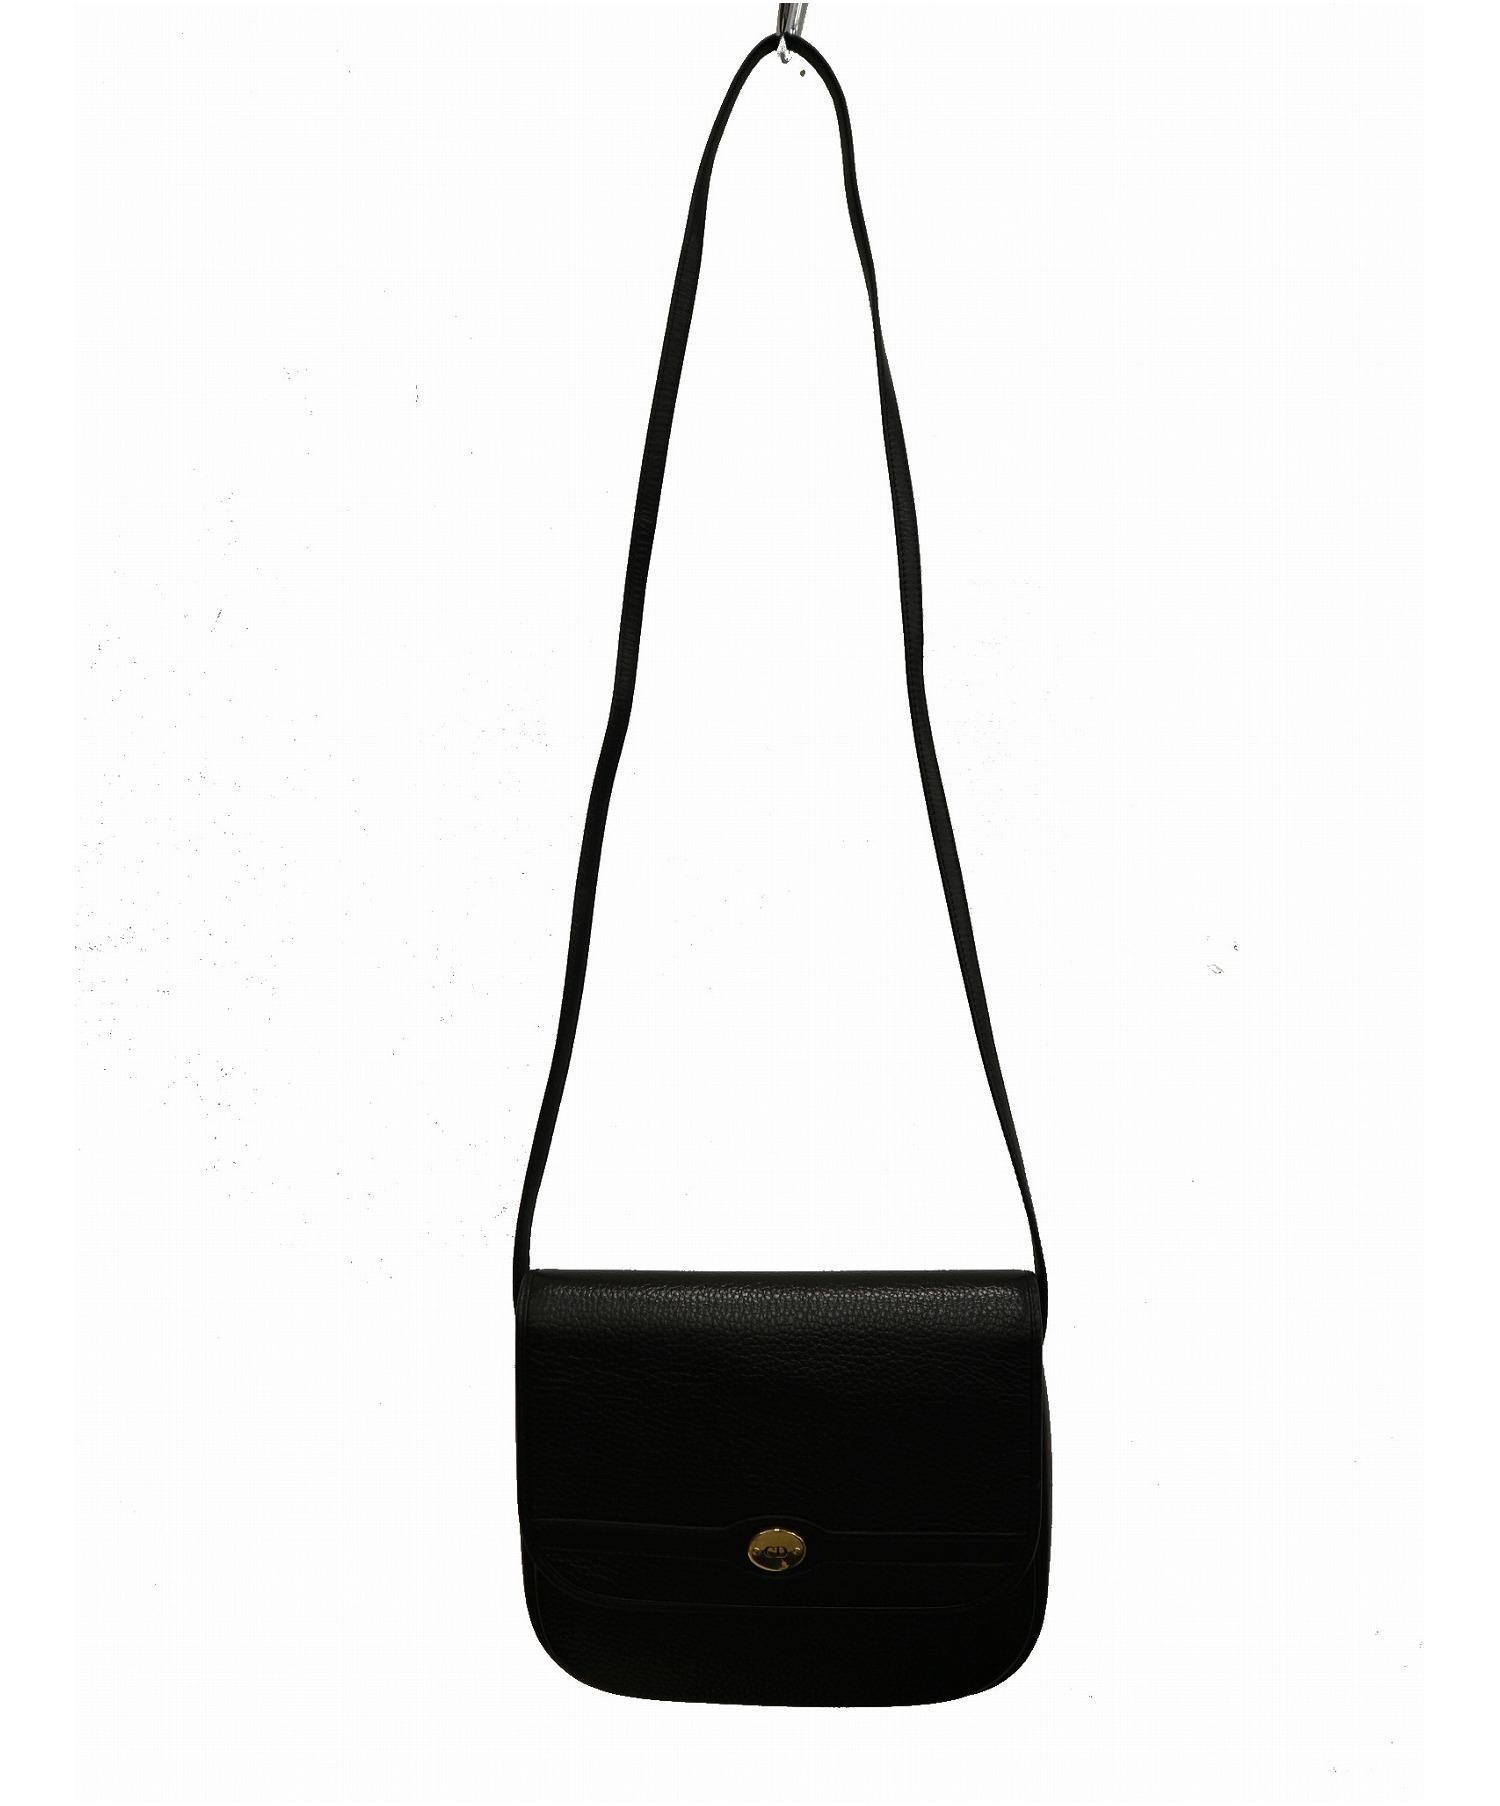 meet 70272 6dc09 [中古]Christian Dior(クリスチャン ディオール)のレディース バッグ ショルダーバッグ